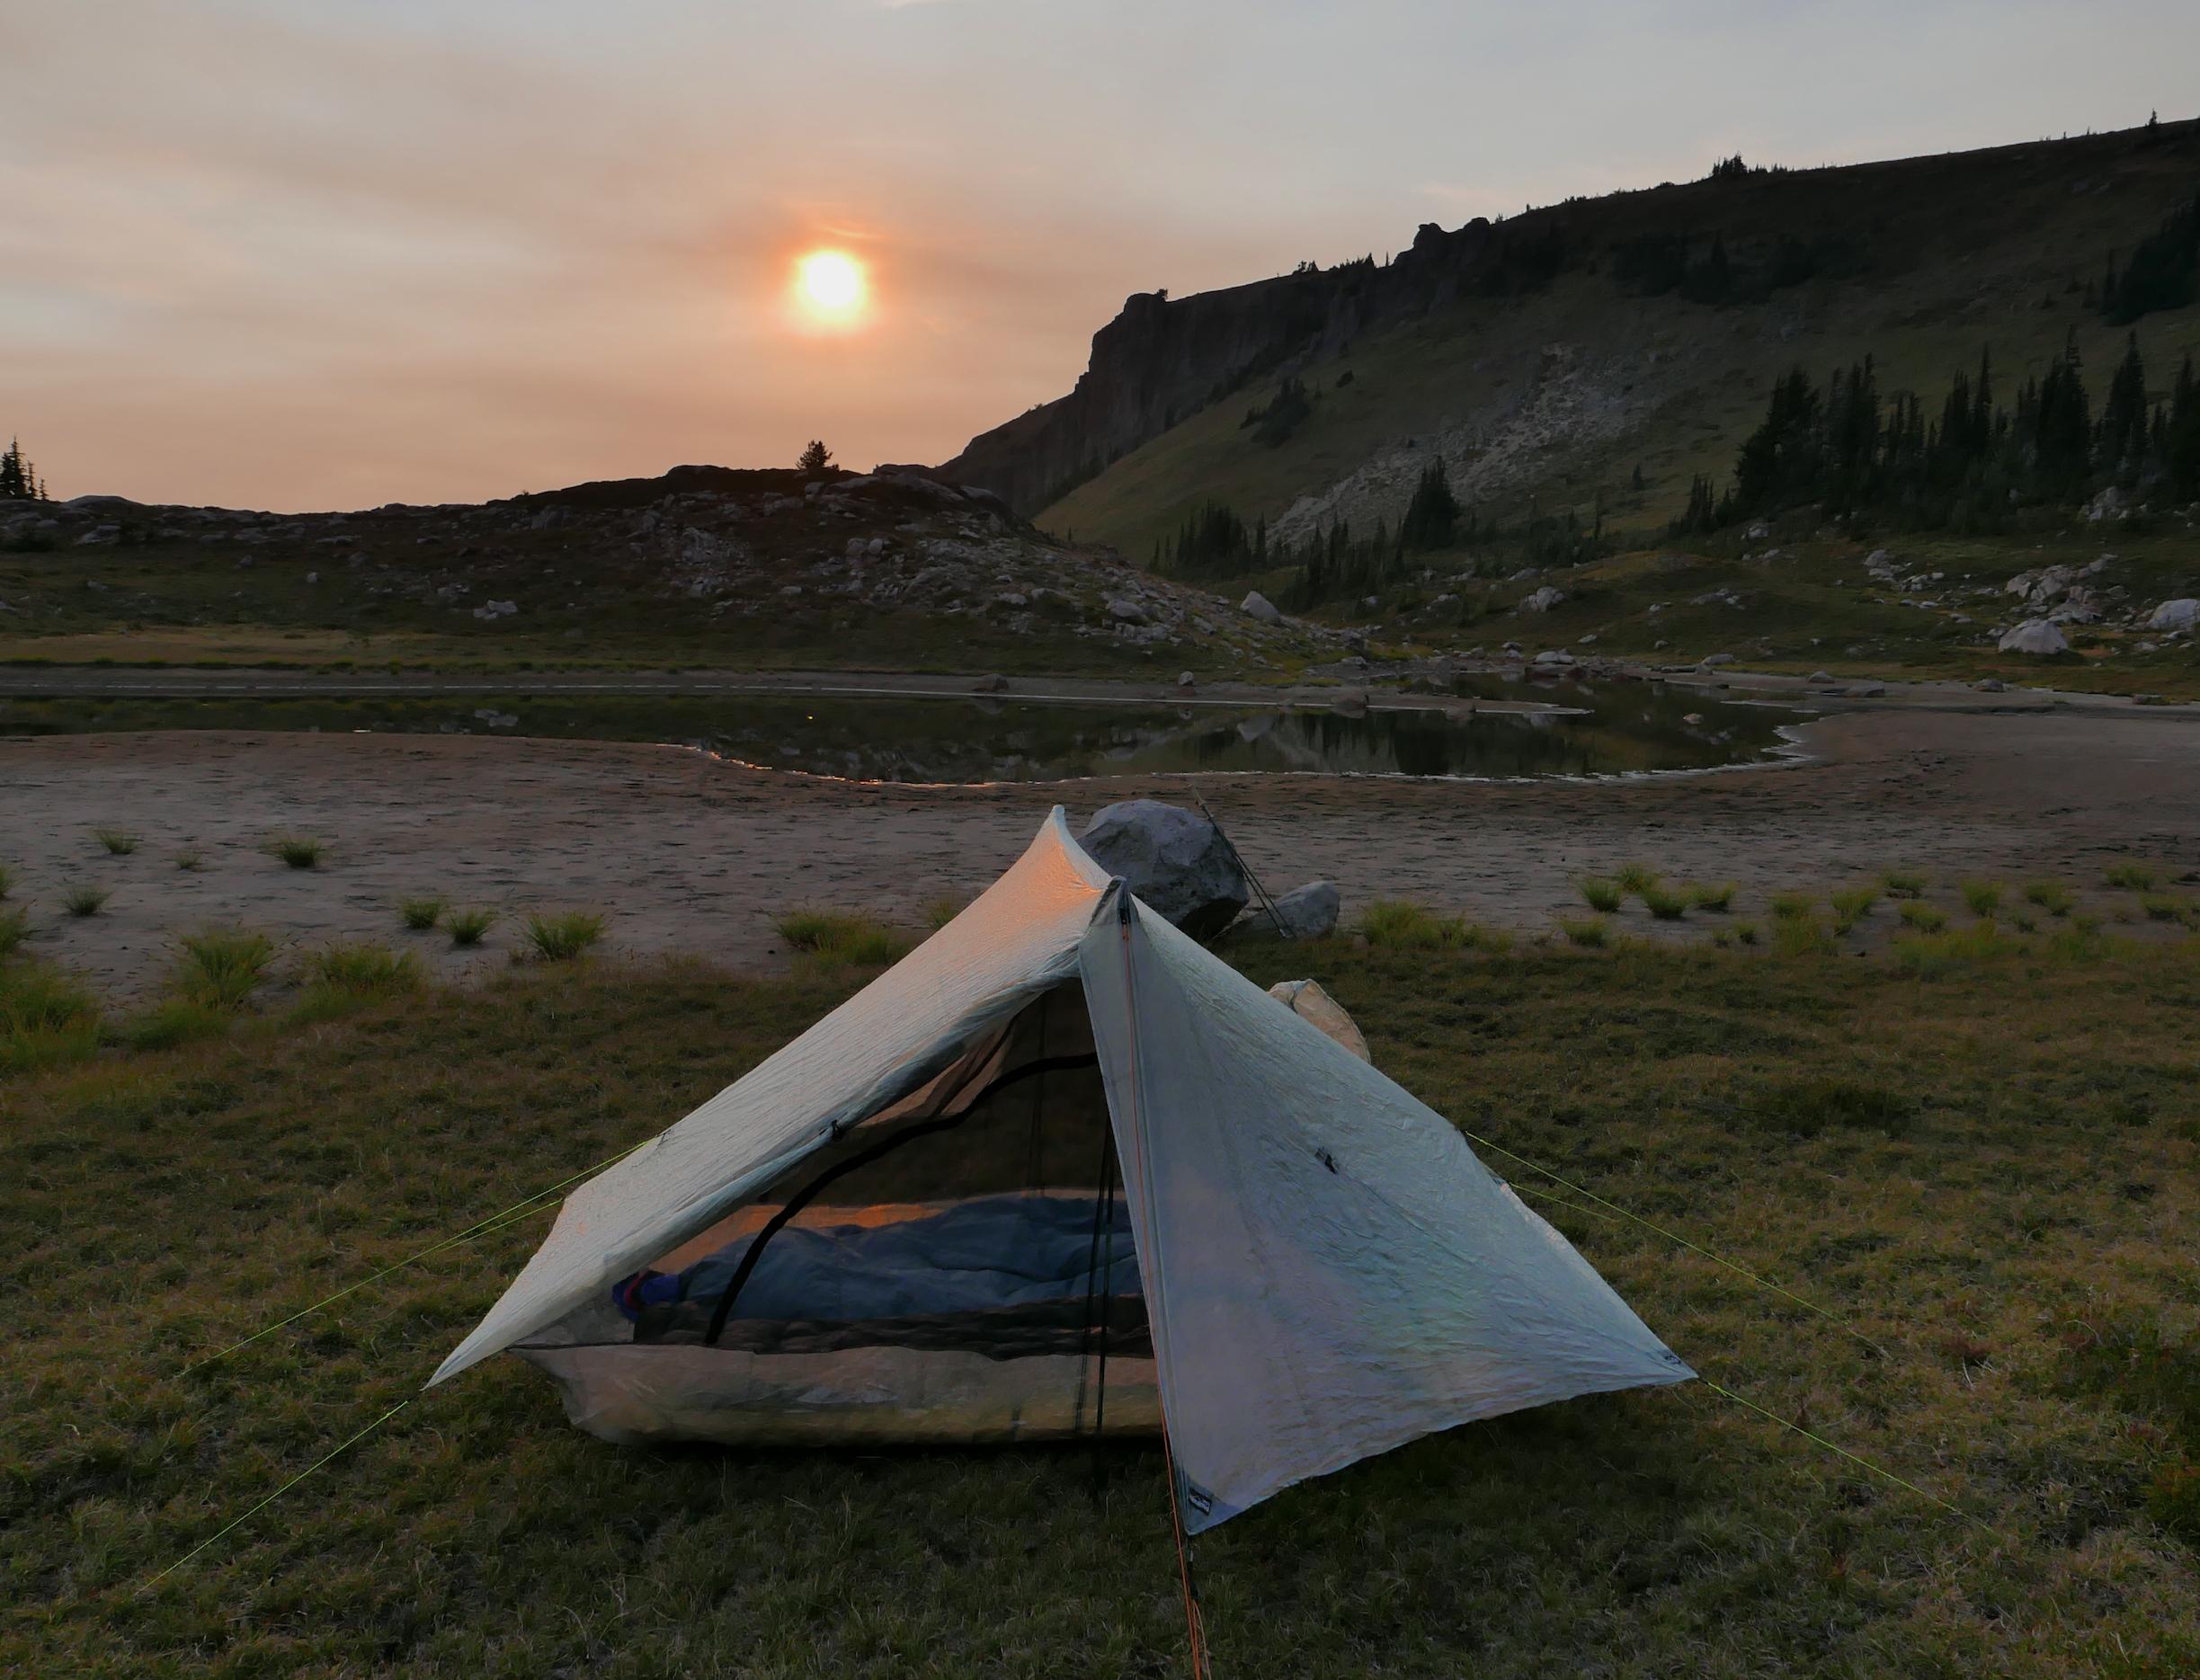 campsite near Windy Gap